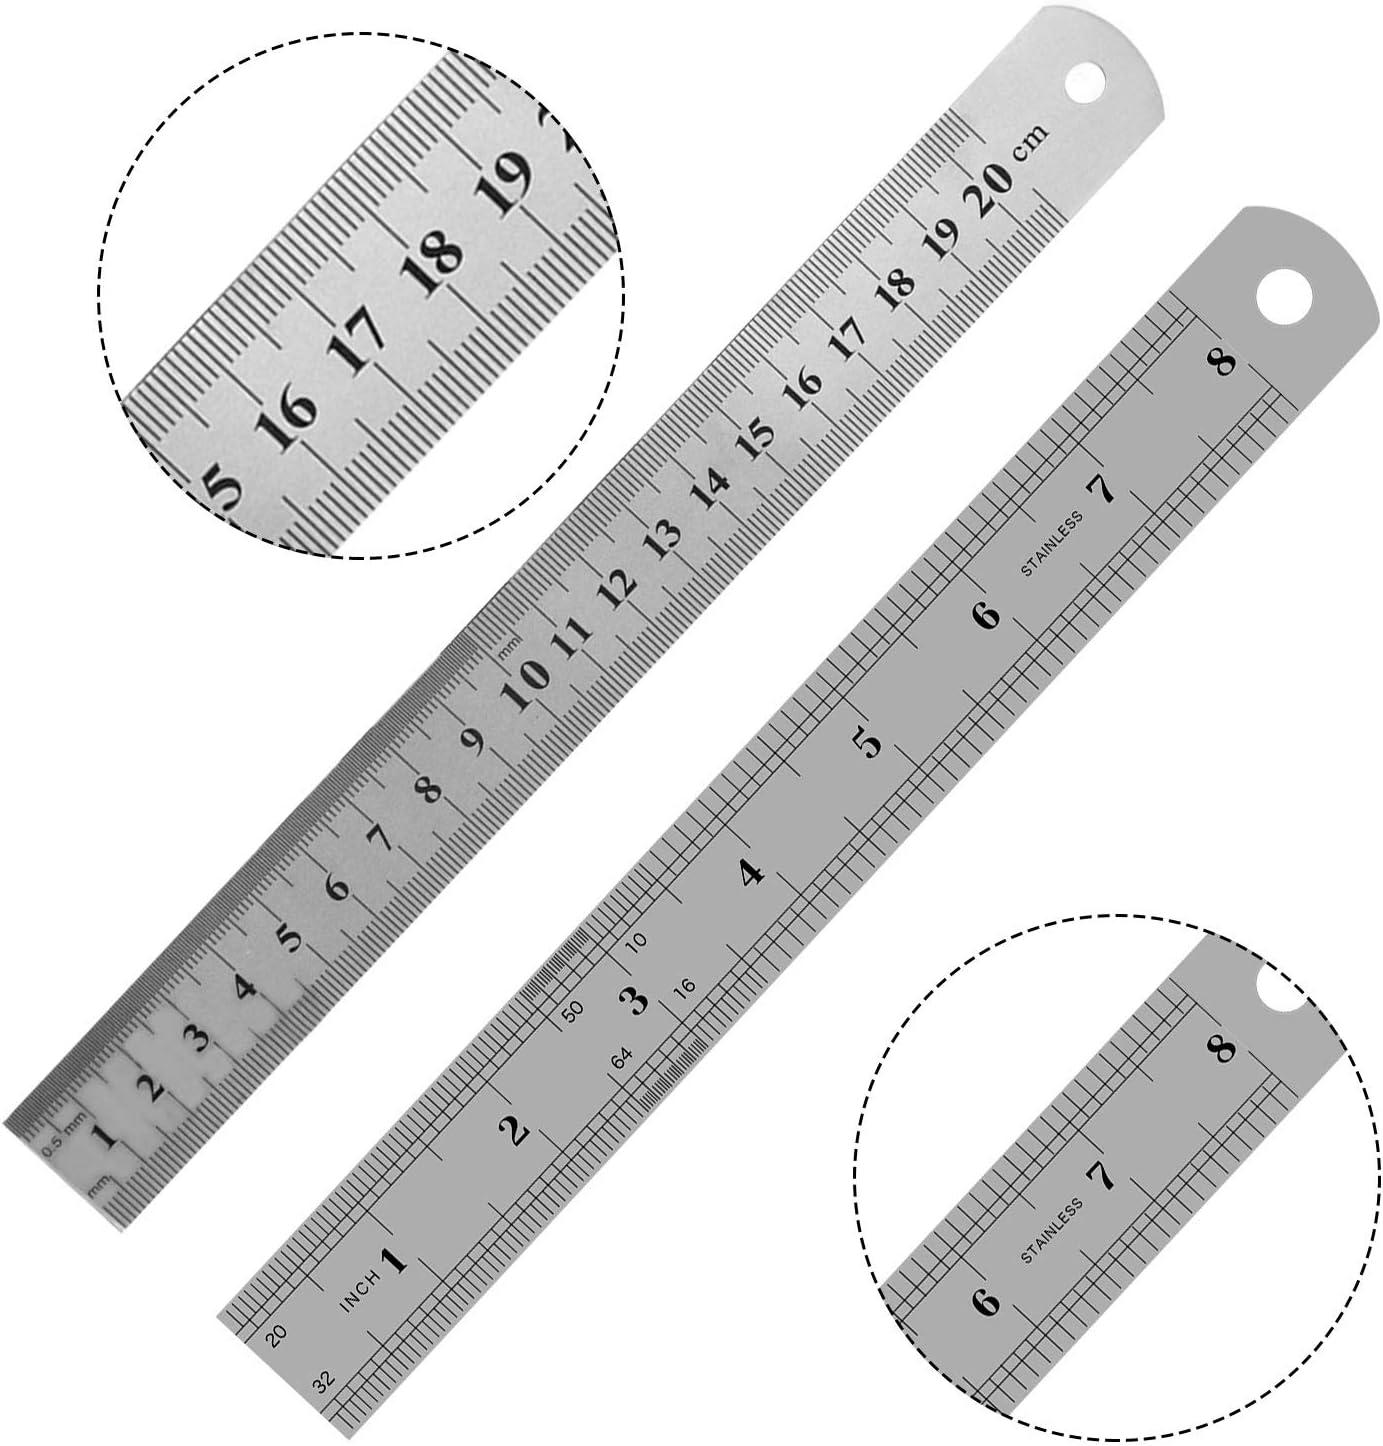 Vinyl Weeder Tools Set with Cleaning Hooks Black Zipper Pocket for DIY Cameos Lettering Weeding Scrapbooking Silhouette Spatula Scissors Scrapers Tweezers 11Pcs Craft Weeding Tools Set Ruler